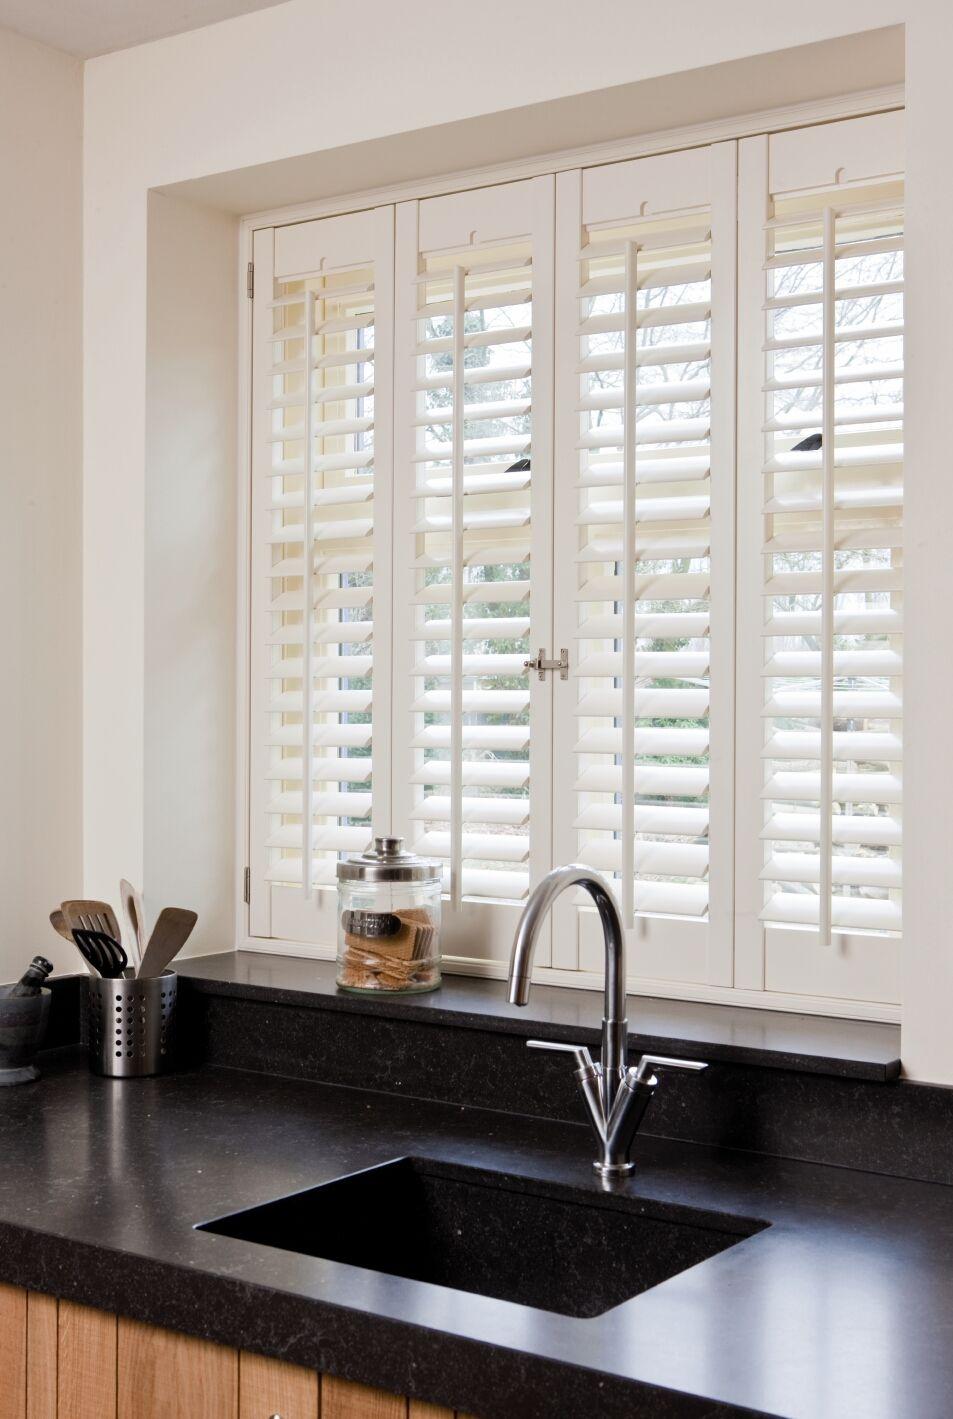 kitchen window shutters aid gas grill in de keuken oh a house shutt more